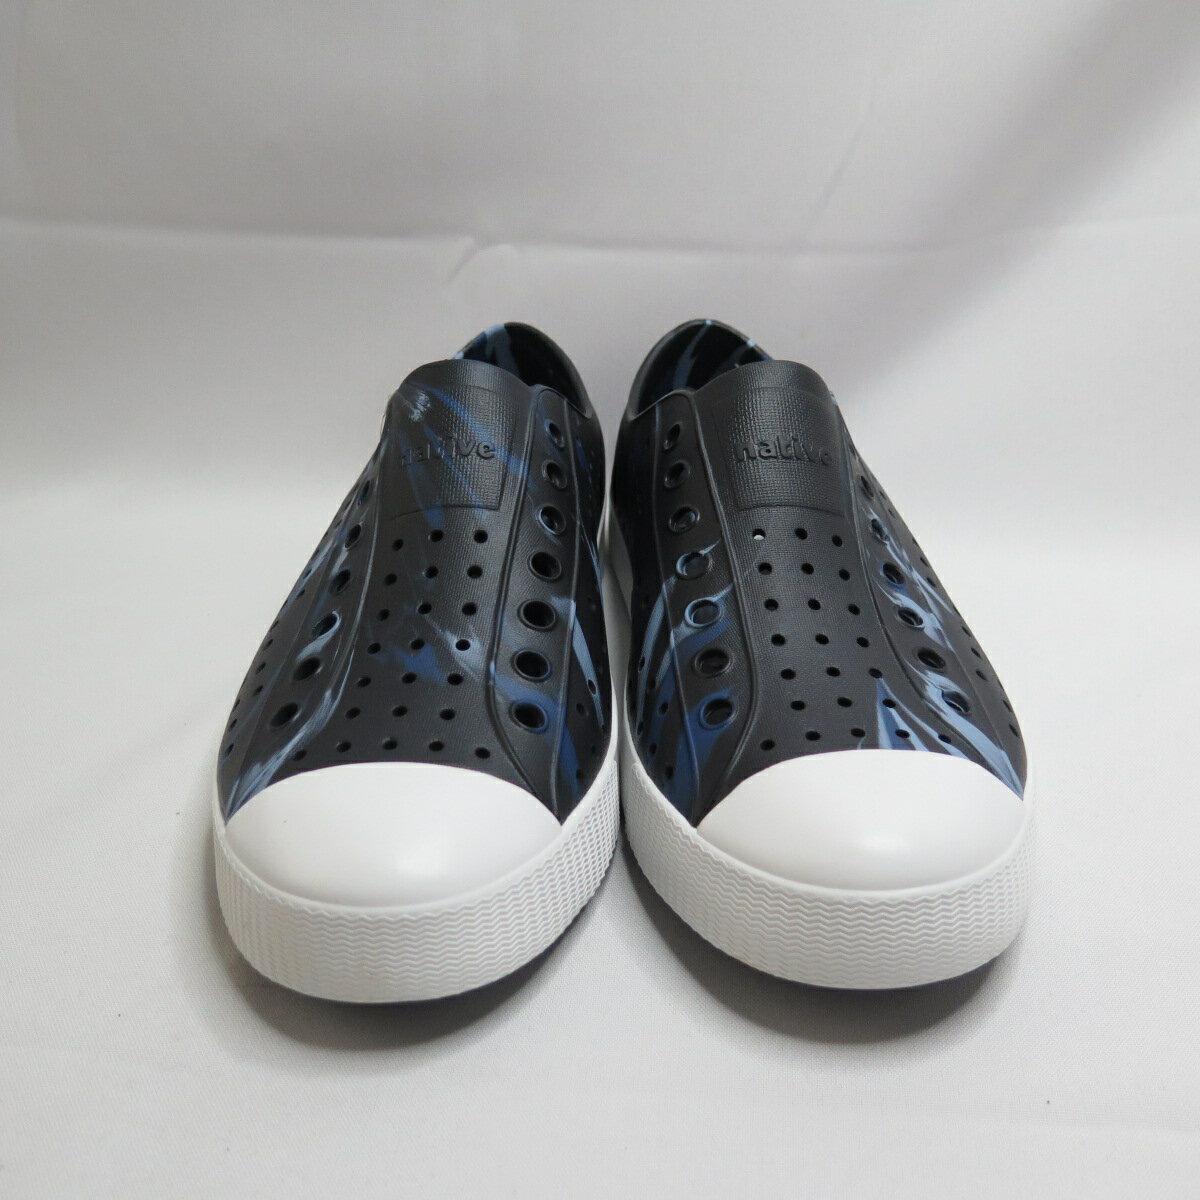 【滿額領券折$150】Native JEFFERSON MARBLED 洞洞鞋 防水 男款 111001108954 黑【iSport】